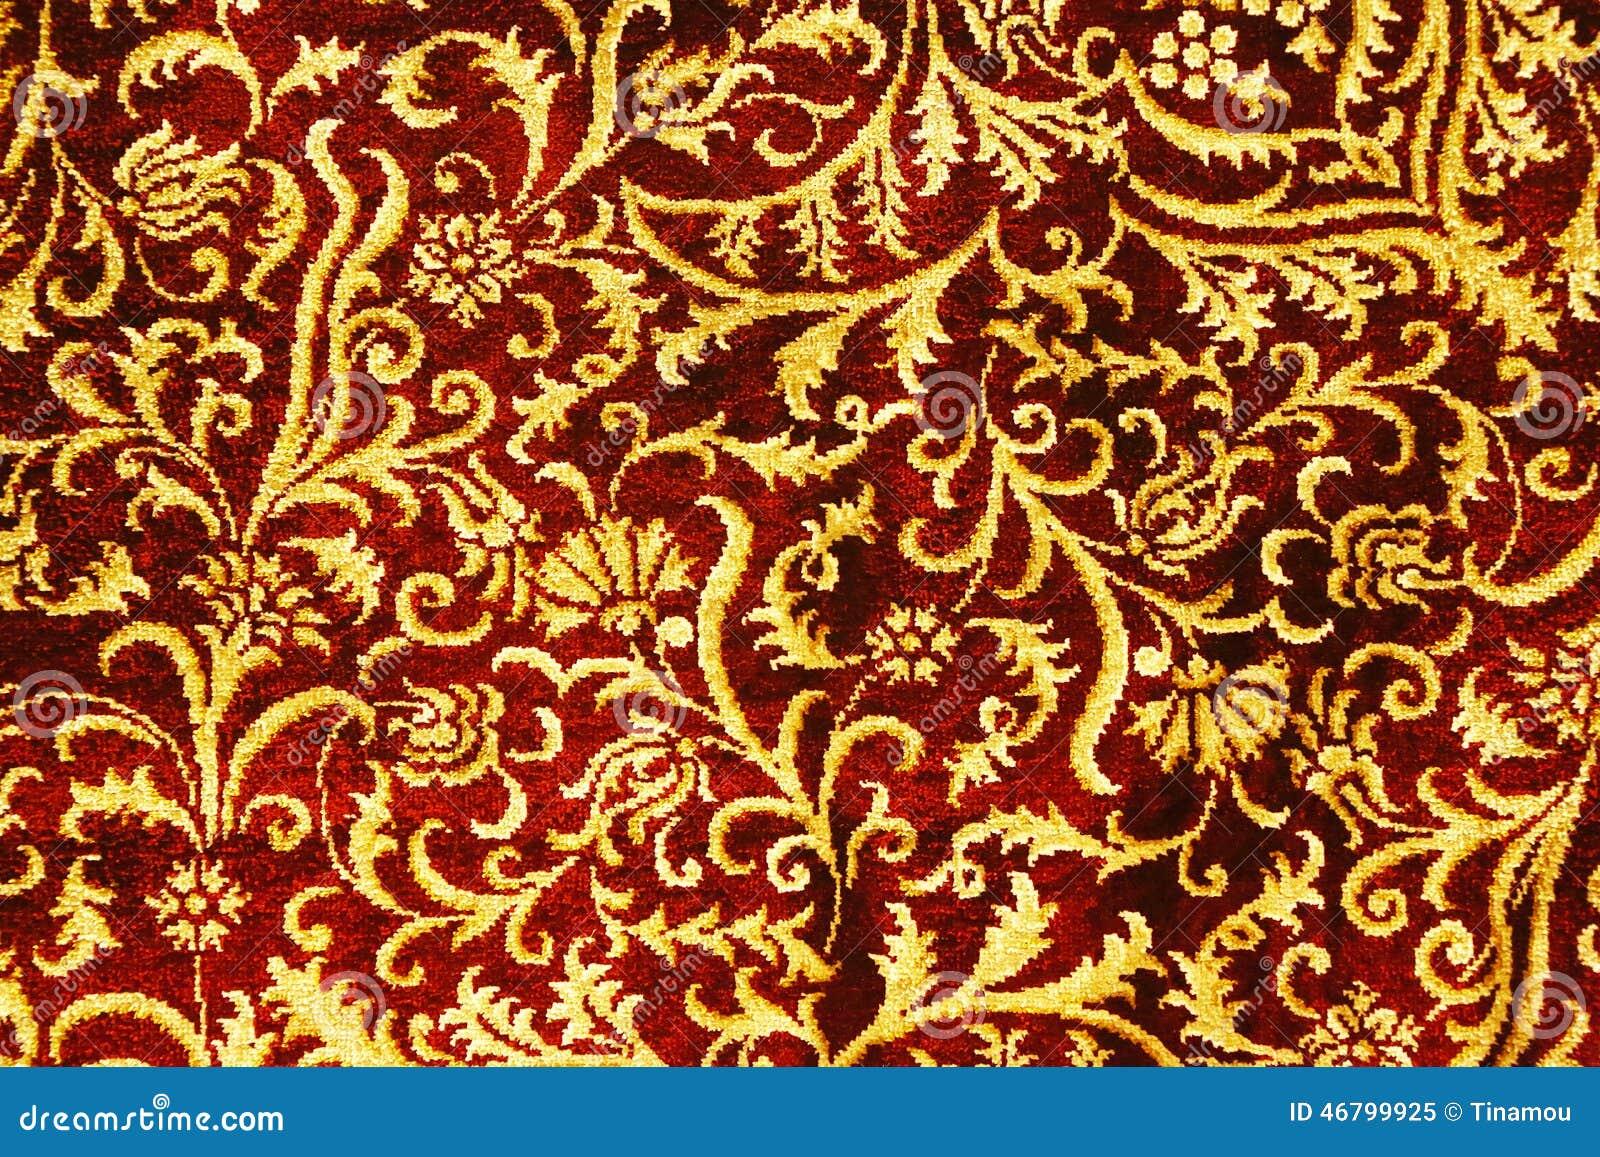 detail of carpet drawing turkey stock photo image 46799925